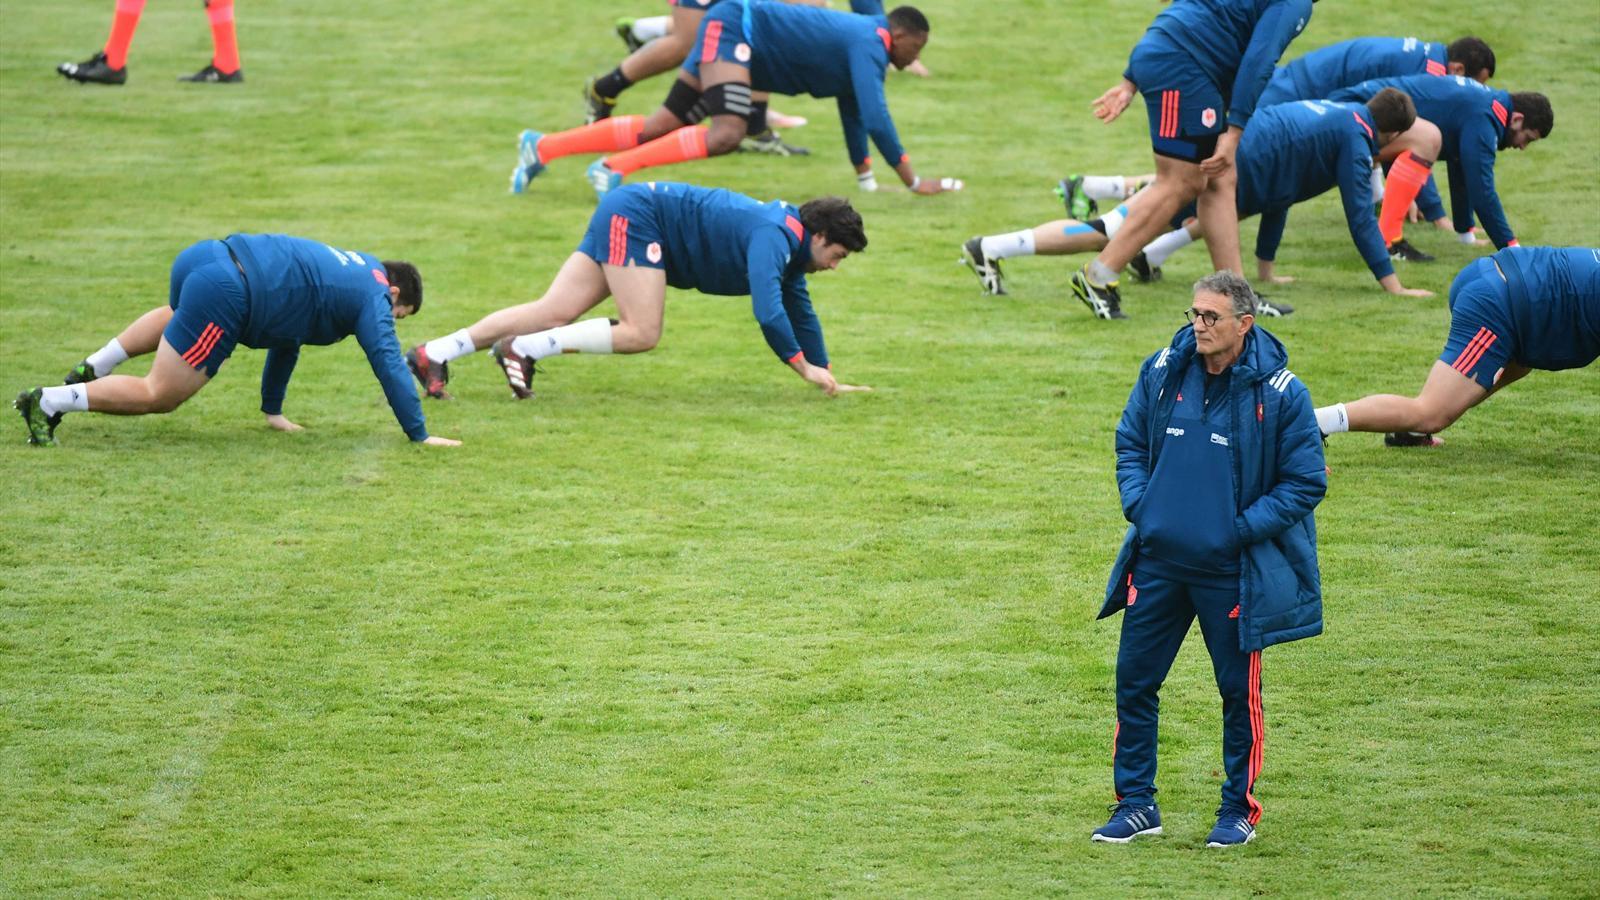 Angleterre france pilier gauche flanker centre for Interieur sport guy noves